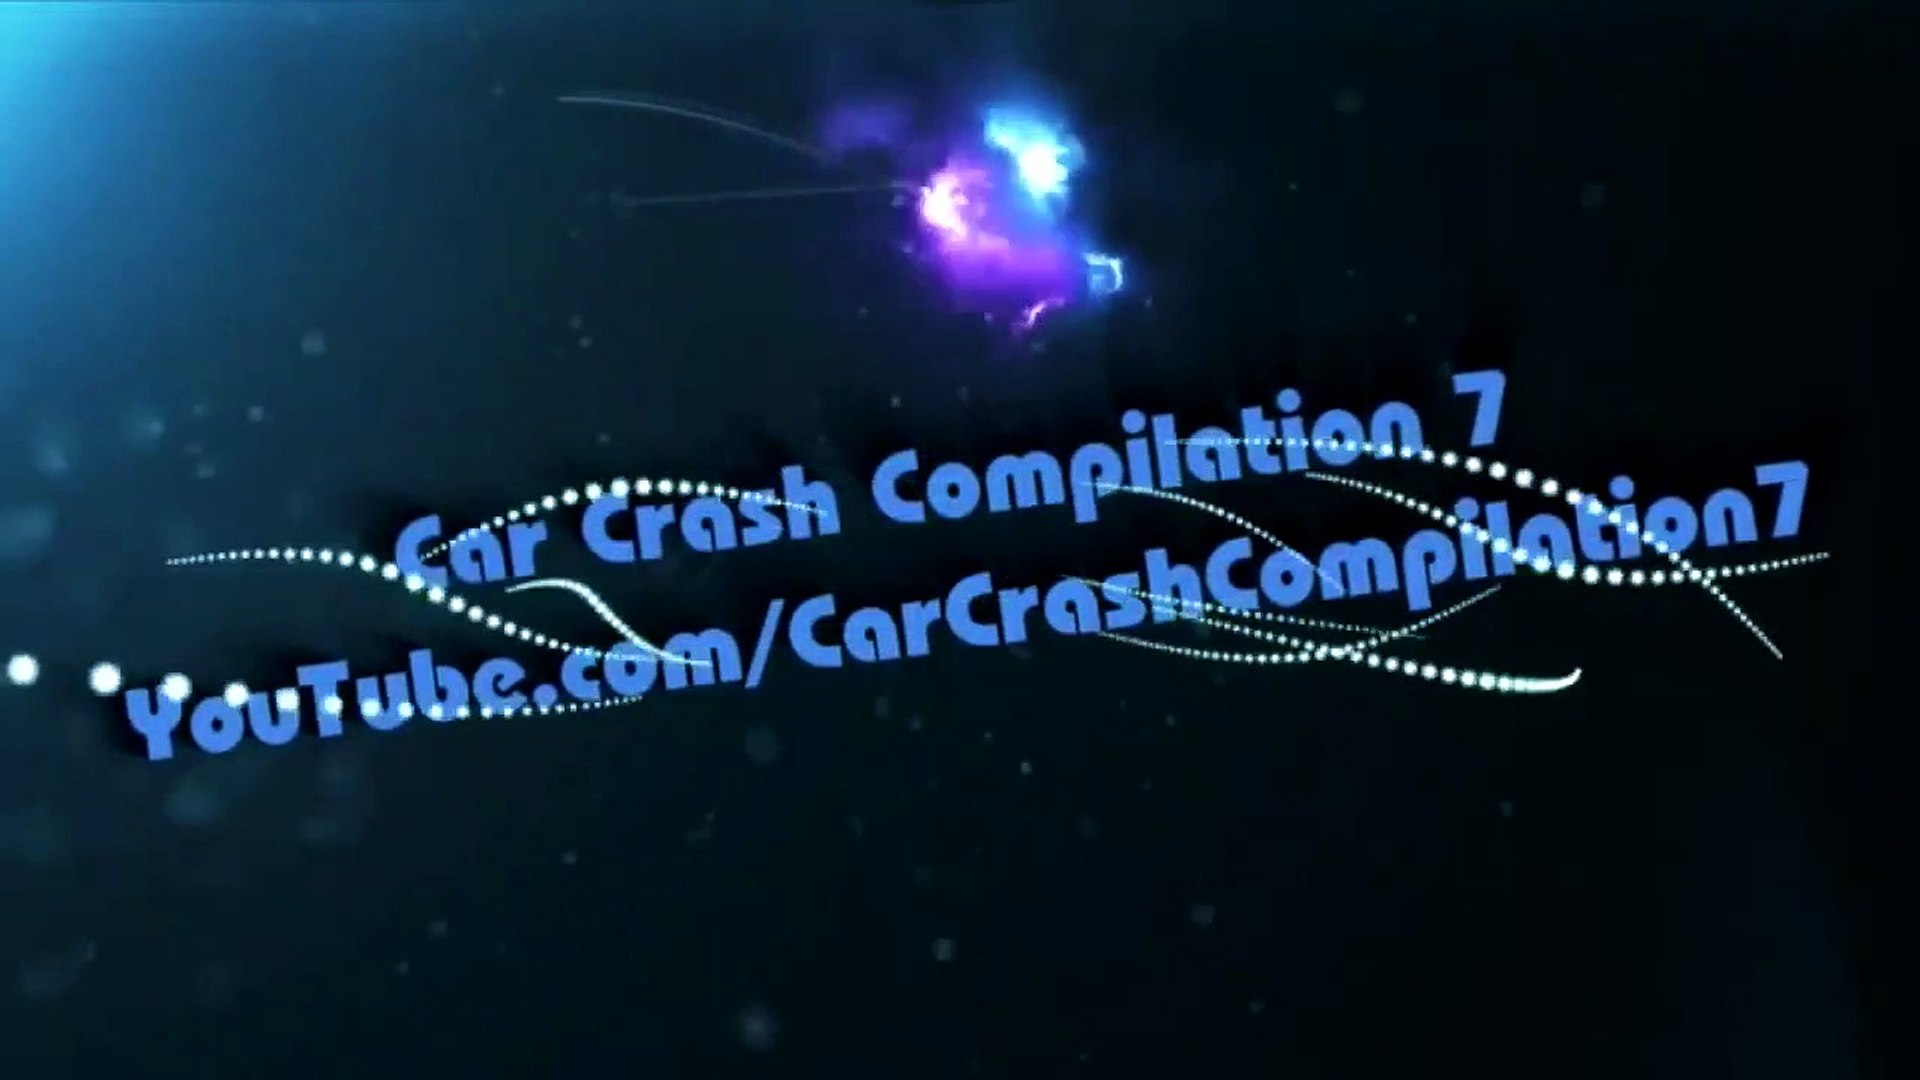 Car Crash Compilation 889 - A